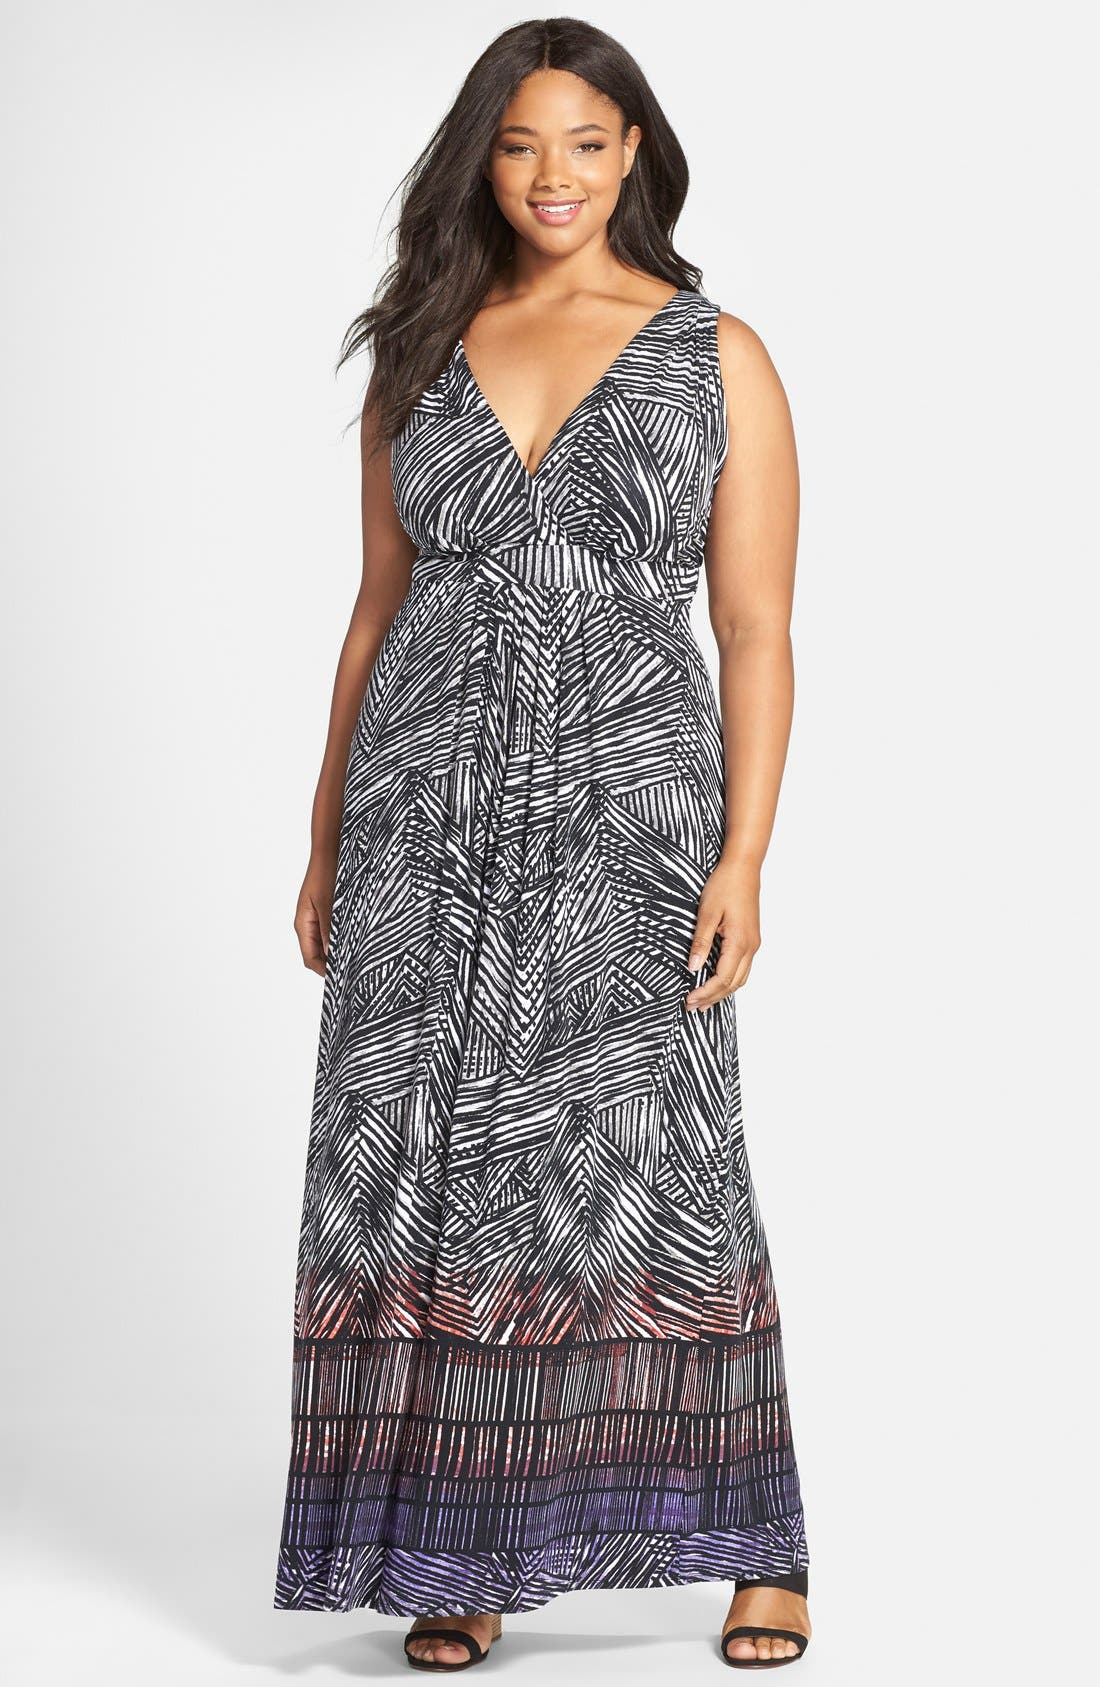 Alternate Image 1 Selected - Tart Chloe Empire Waist Maxi Dress (Plus Size)